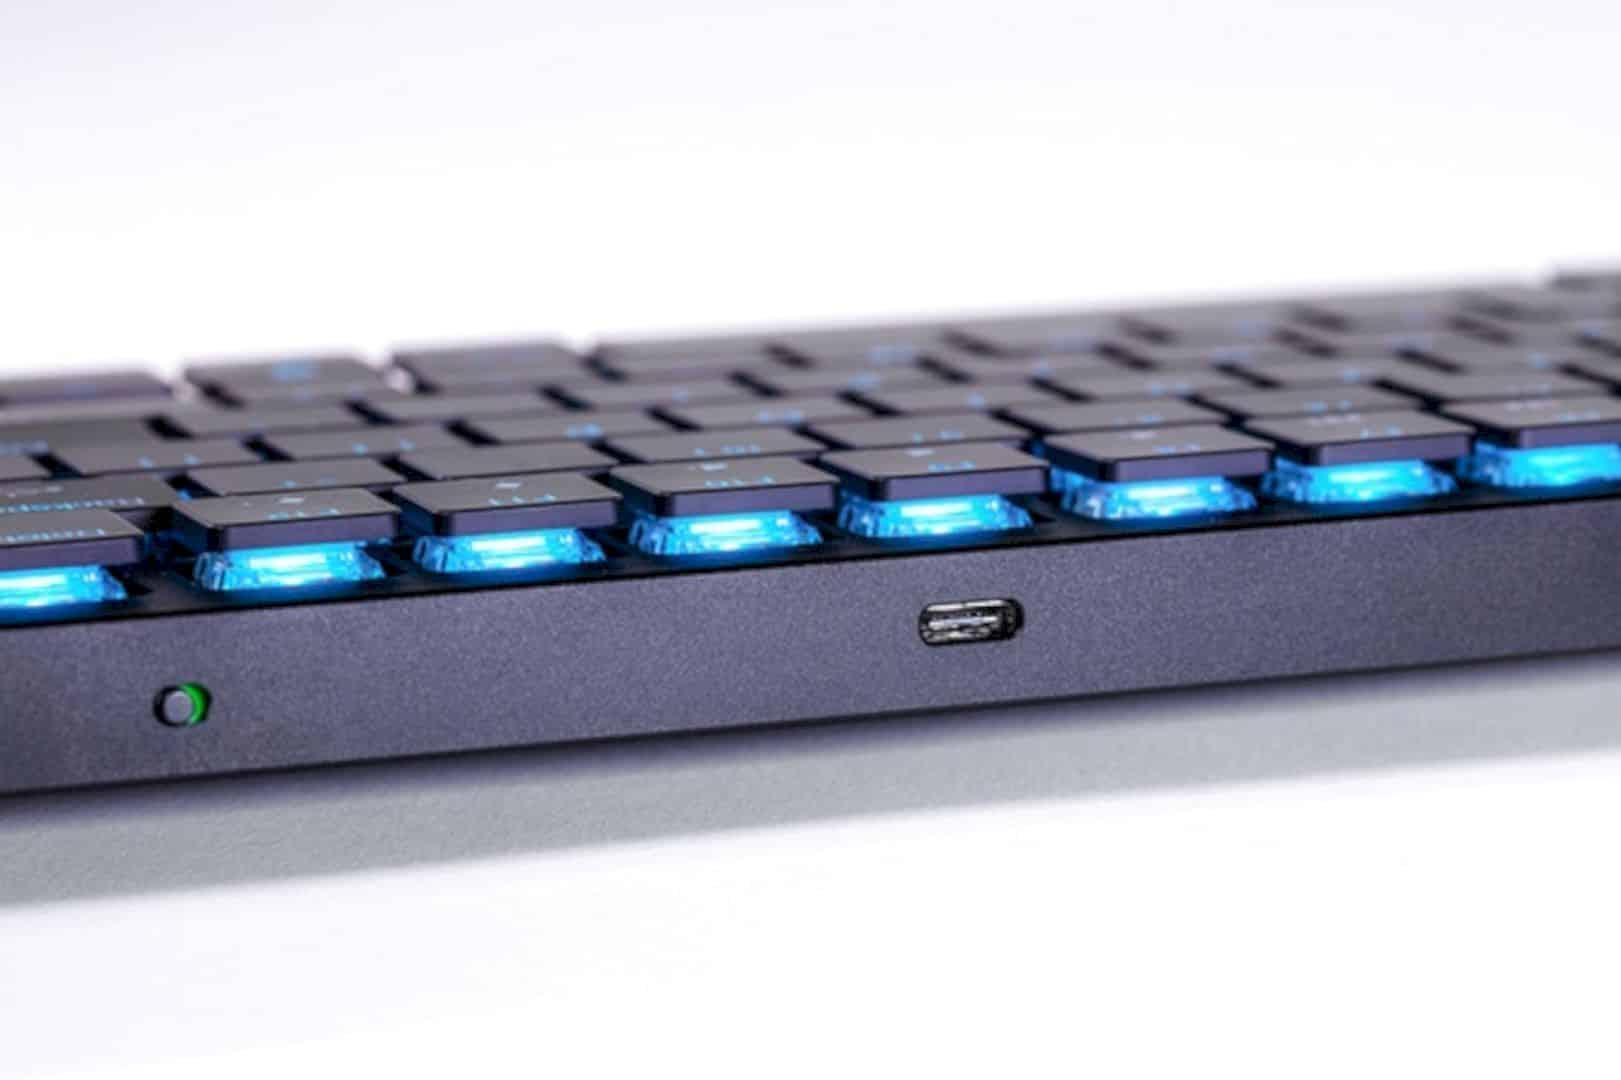 Hexgears X 1 Mechanical Keyboard 5